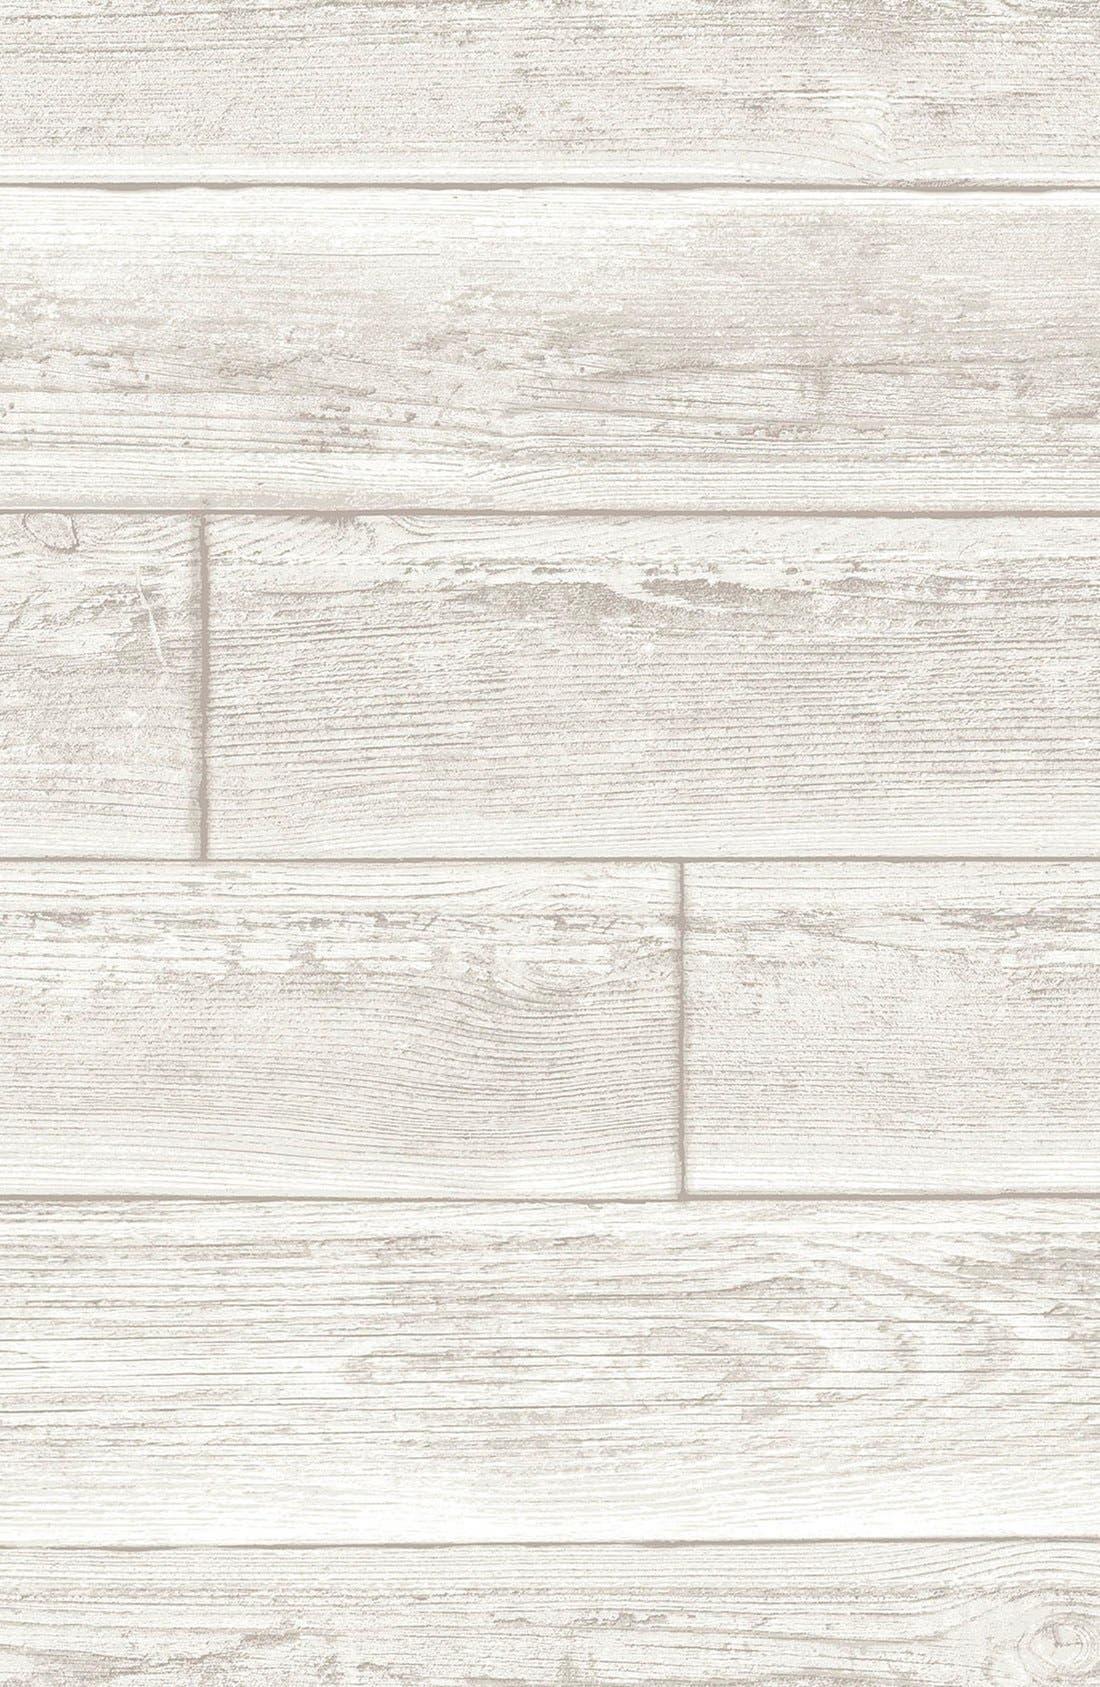 Main Image - Wallpops Serene Reusable Peel & Stick Vinyl Wallpaper